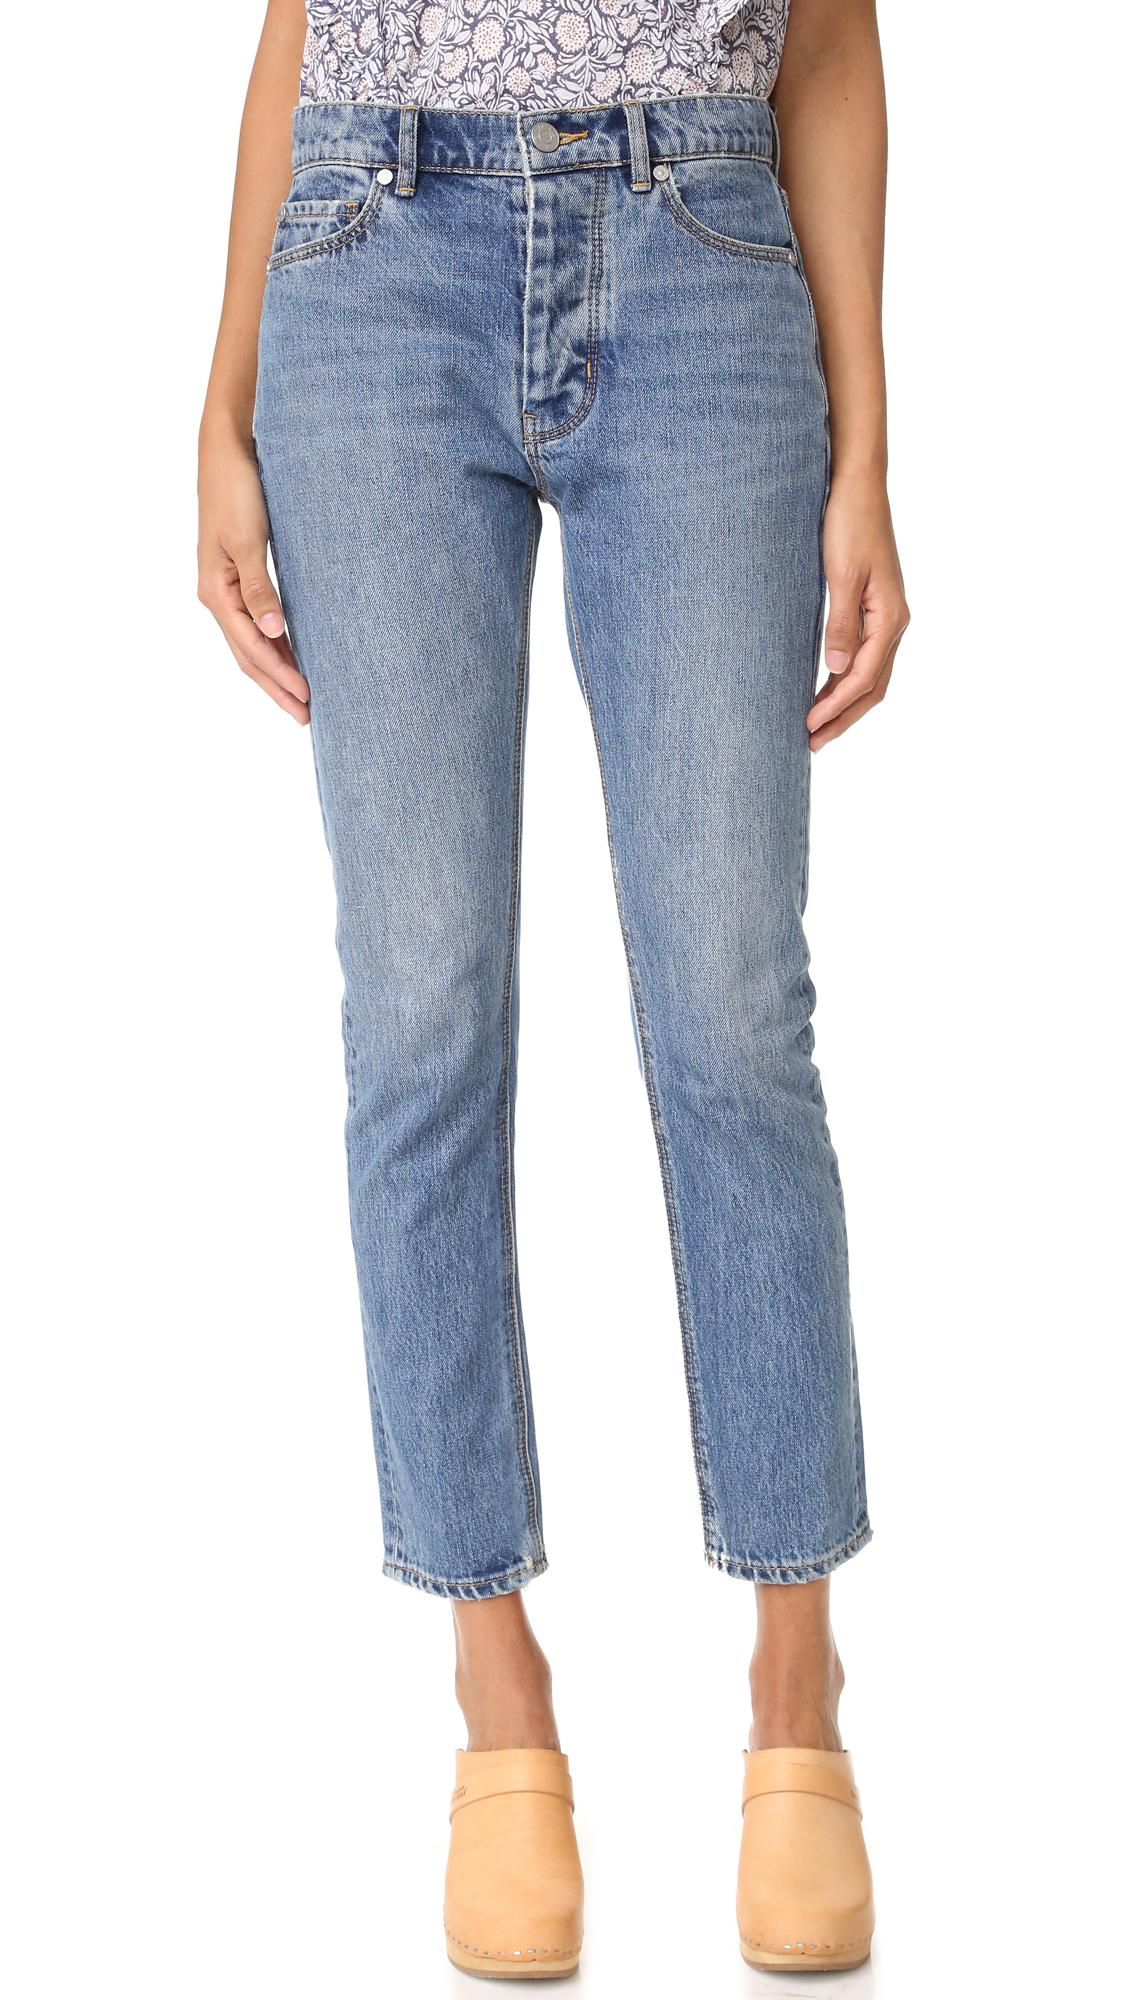 La Vie Rebecca Taylor Beatrice Jeans - Loveworn Wash at Shopbop